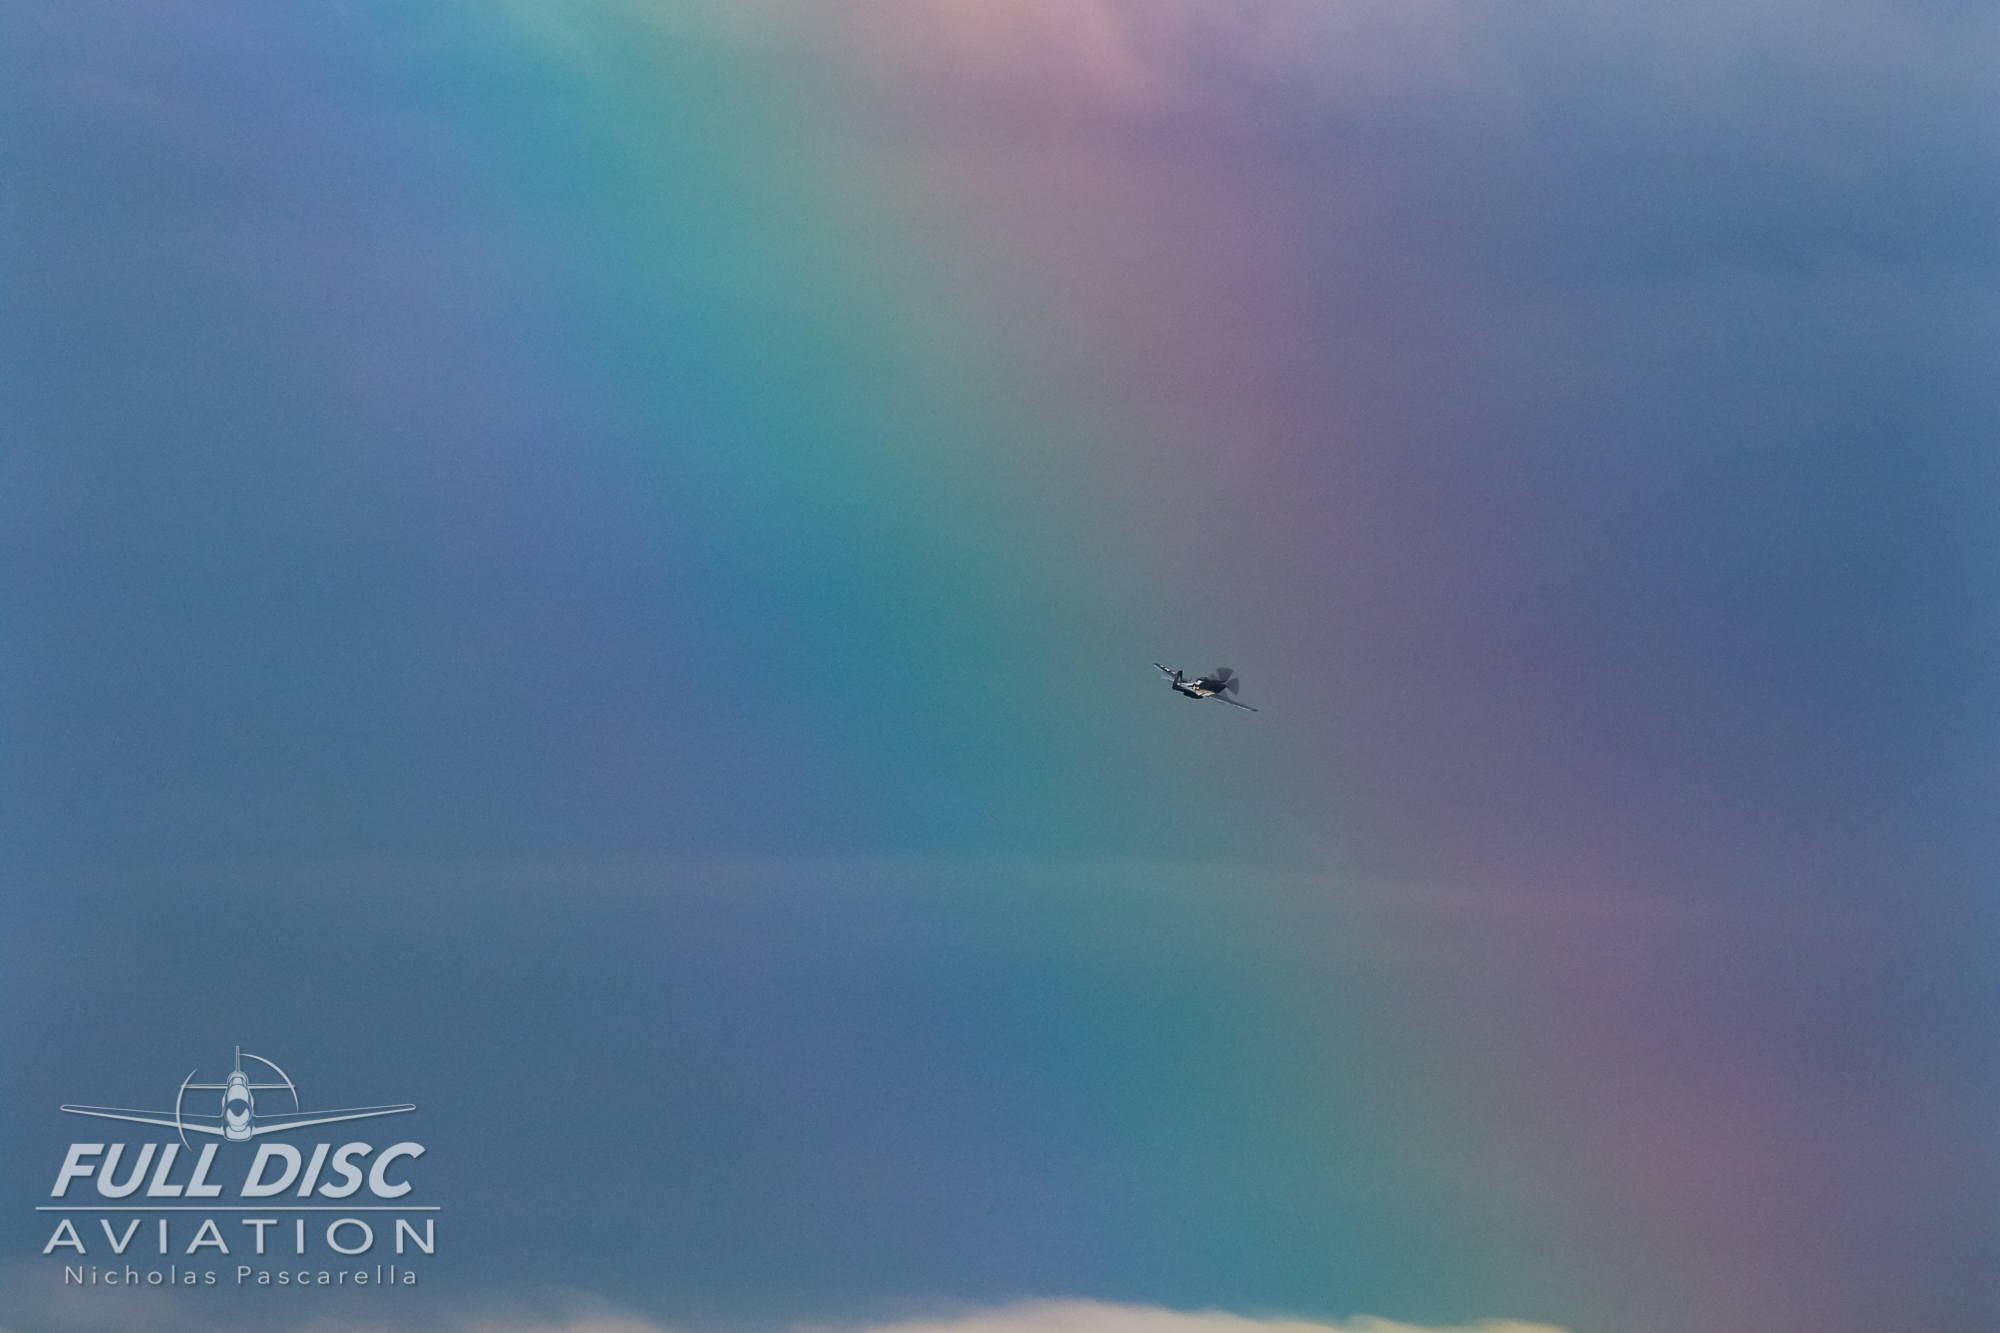 mustang_p51_rainbow_andrewmckenna_fulldiscaviation_nickpascarella_.jpg